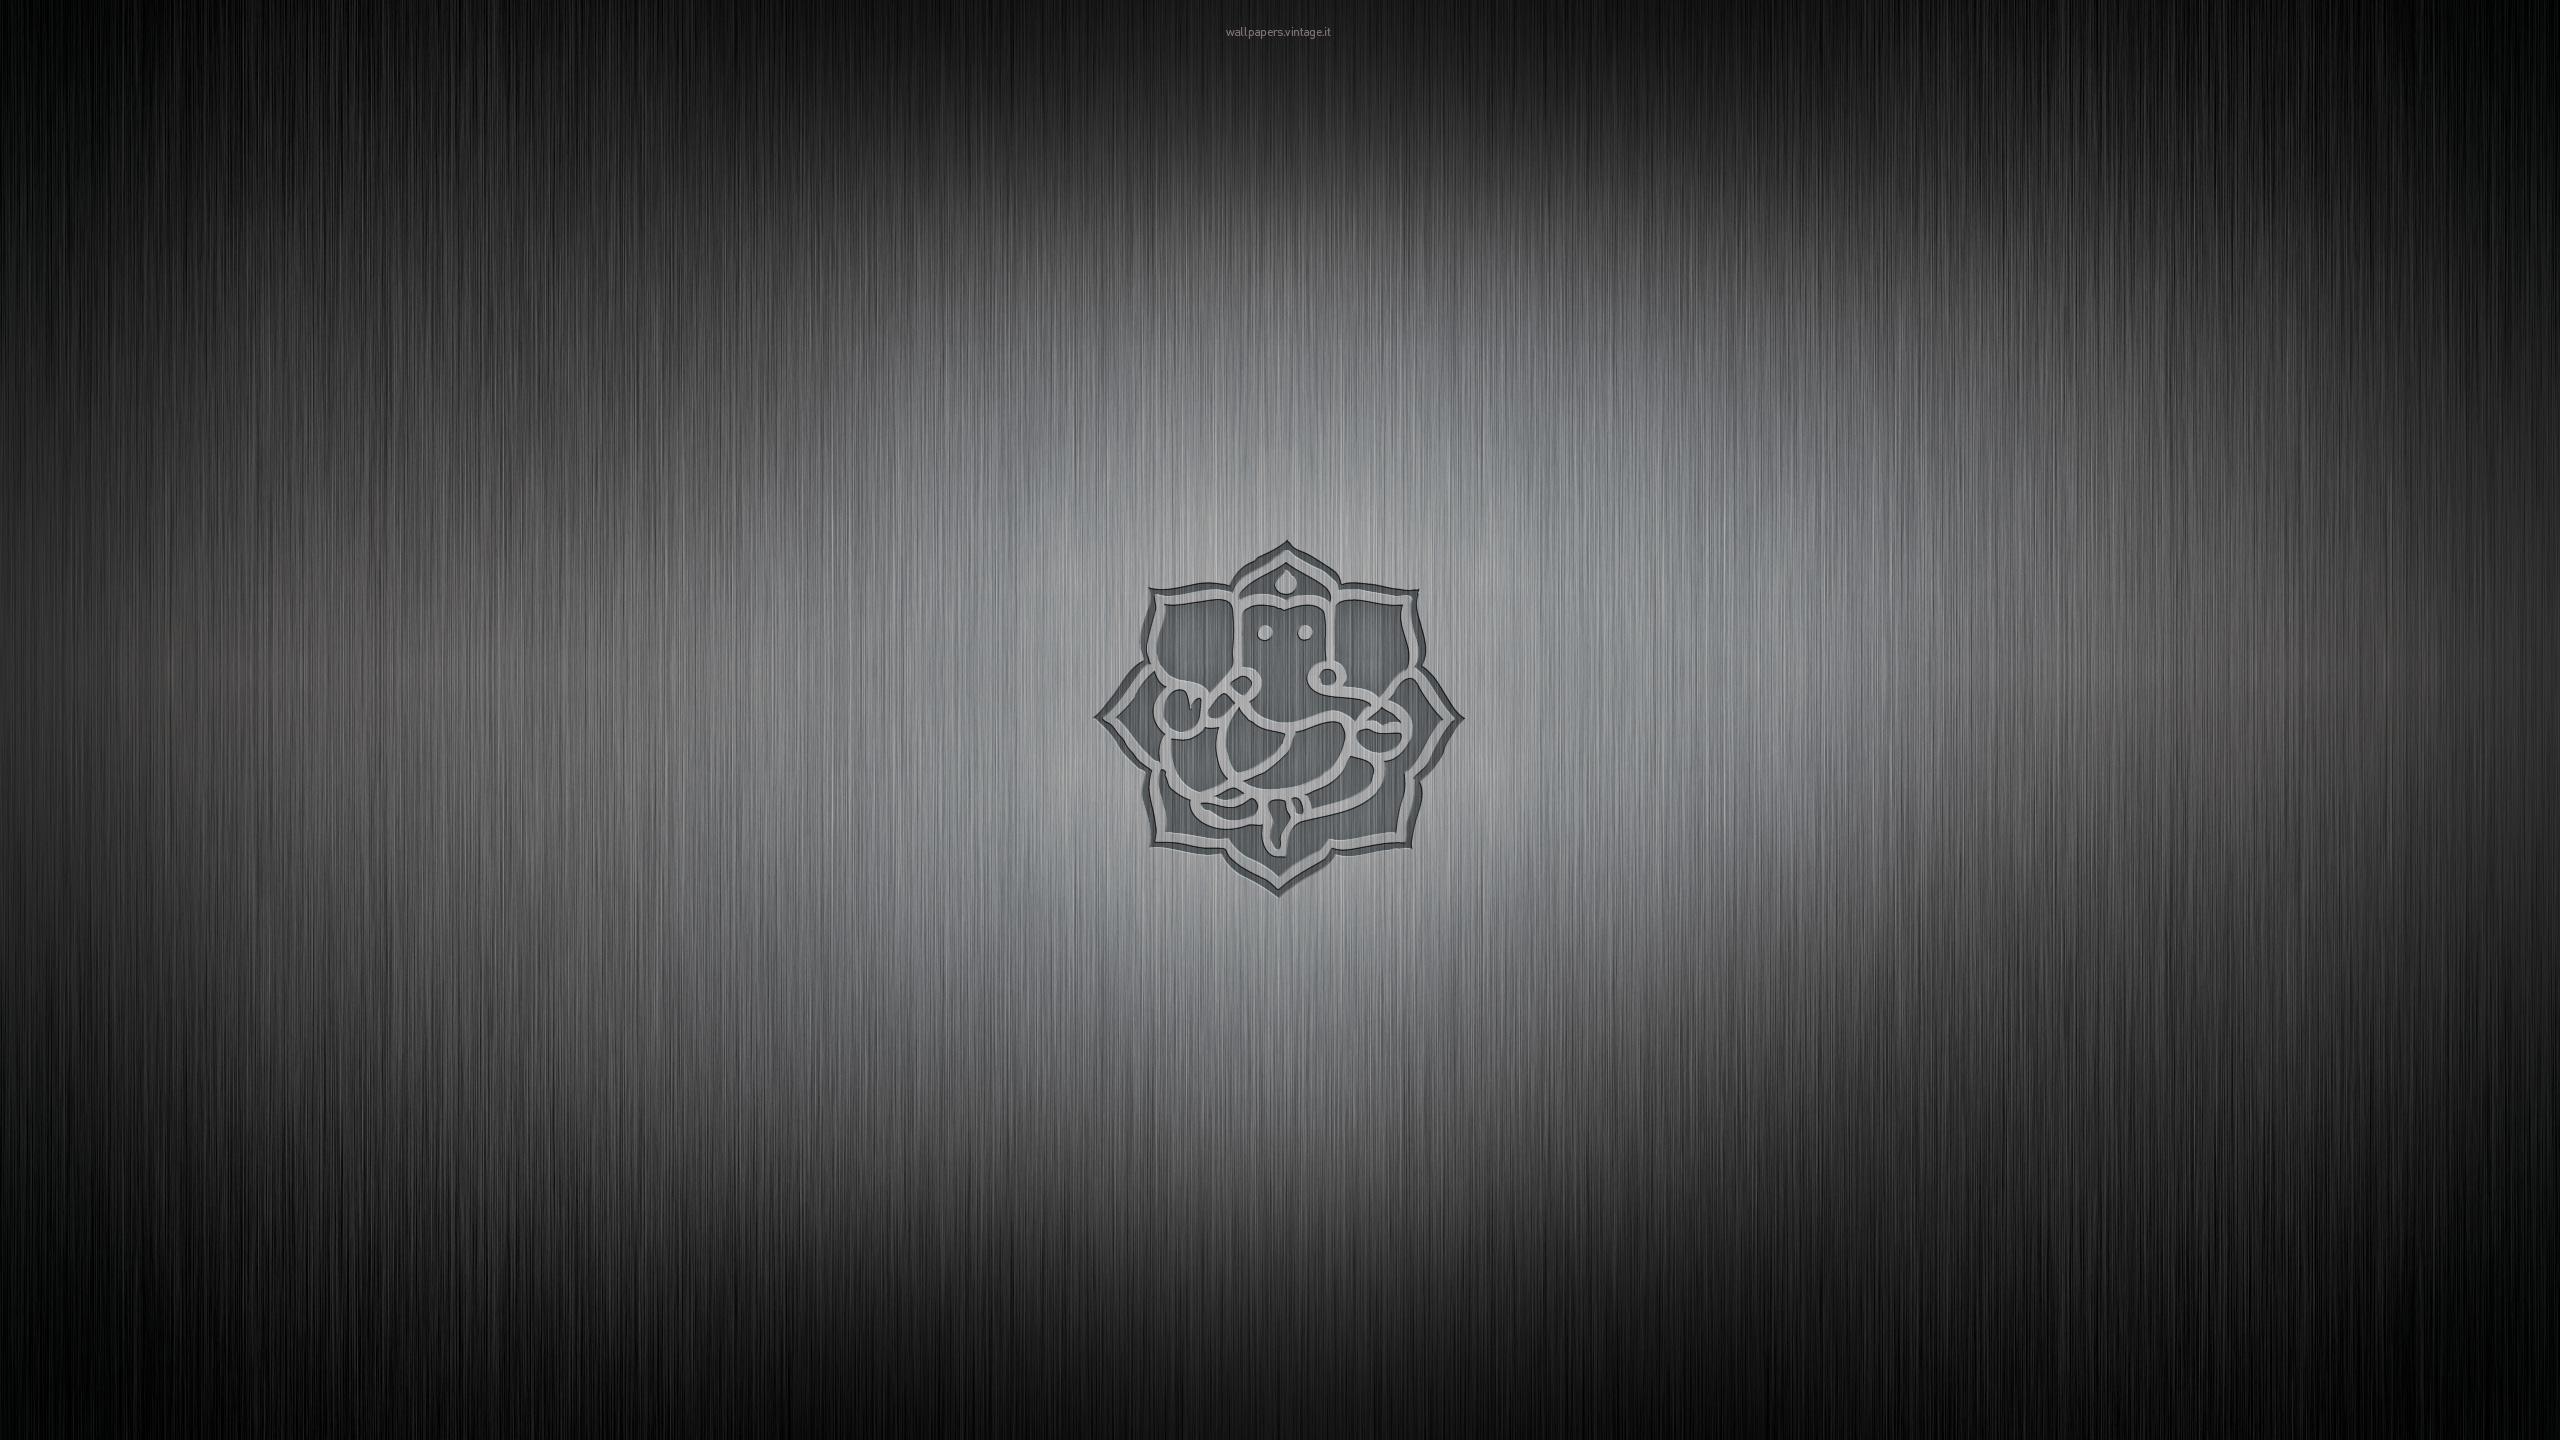 Hd wallpaper ganesh - Desktop 16 9